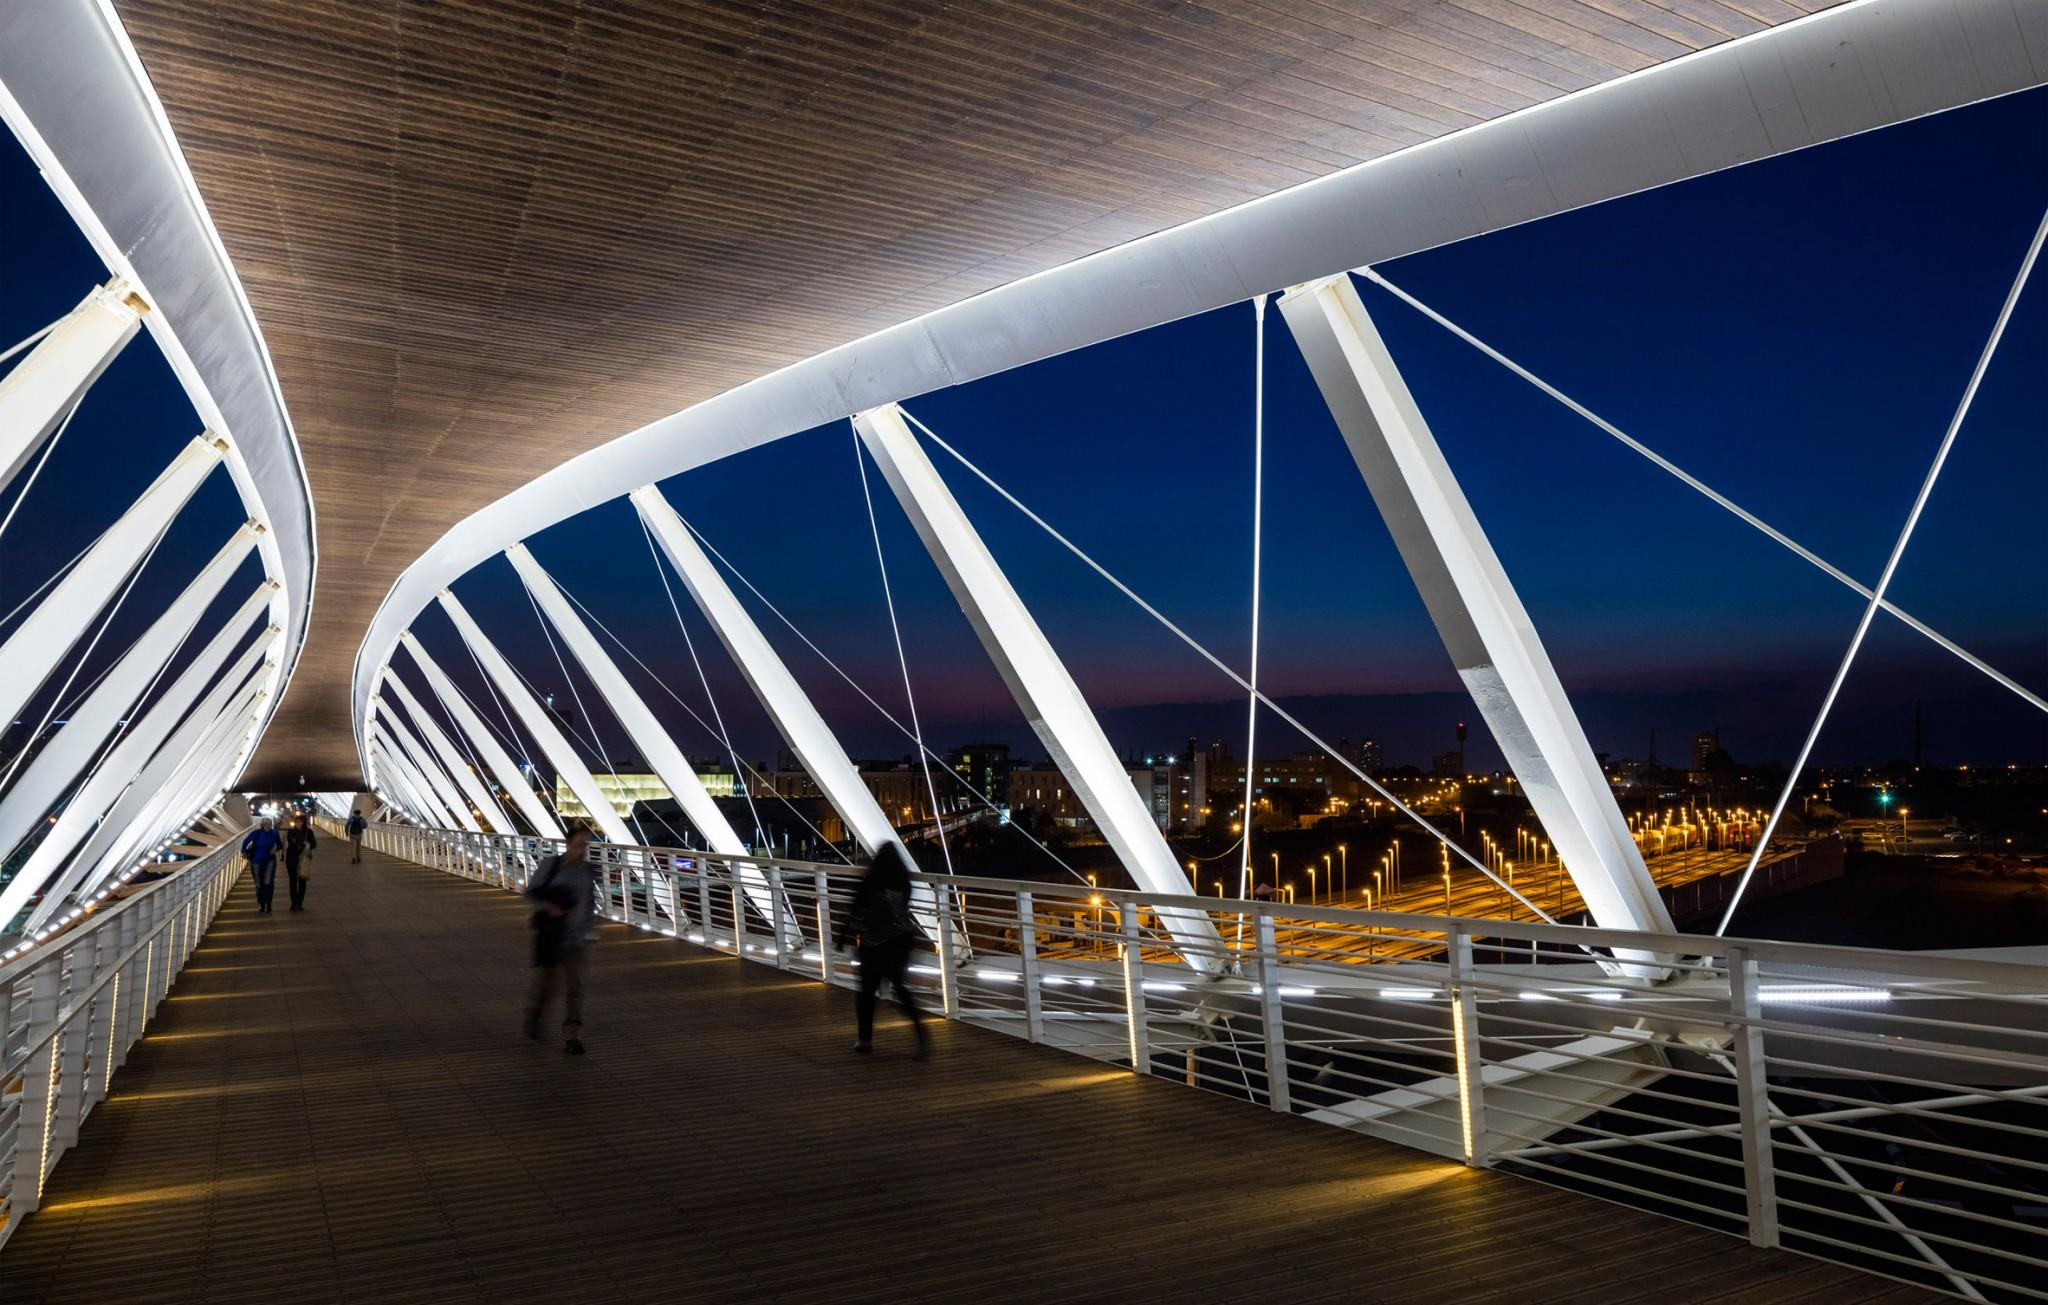 Beersheva Station Bridge. Photo by Amit Geron